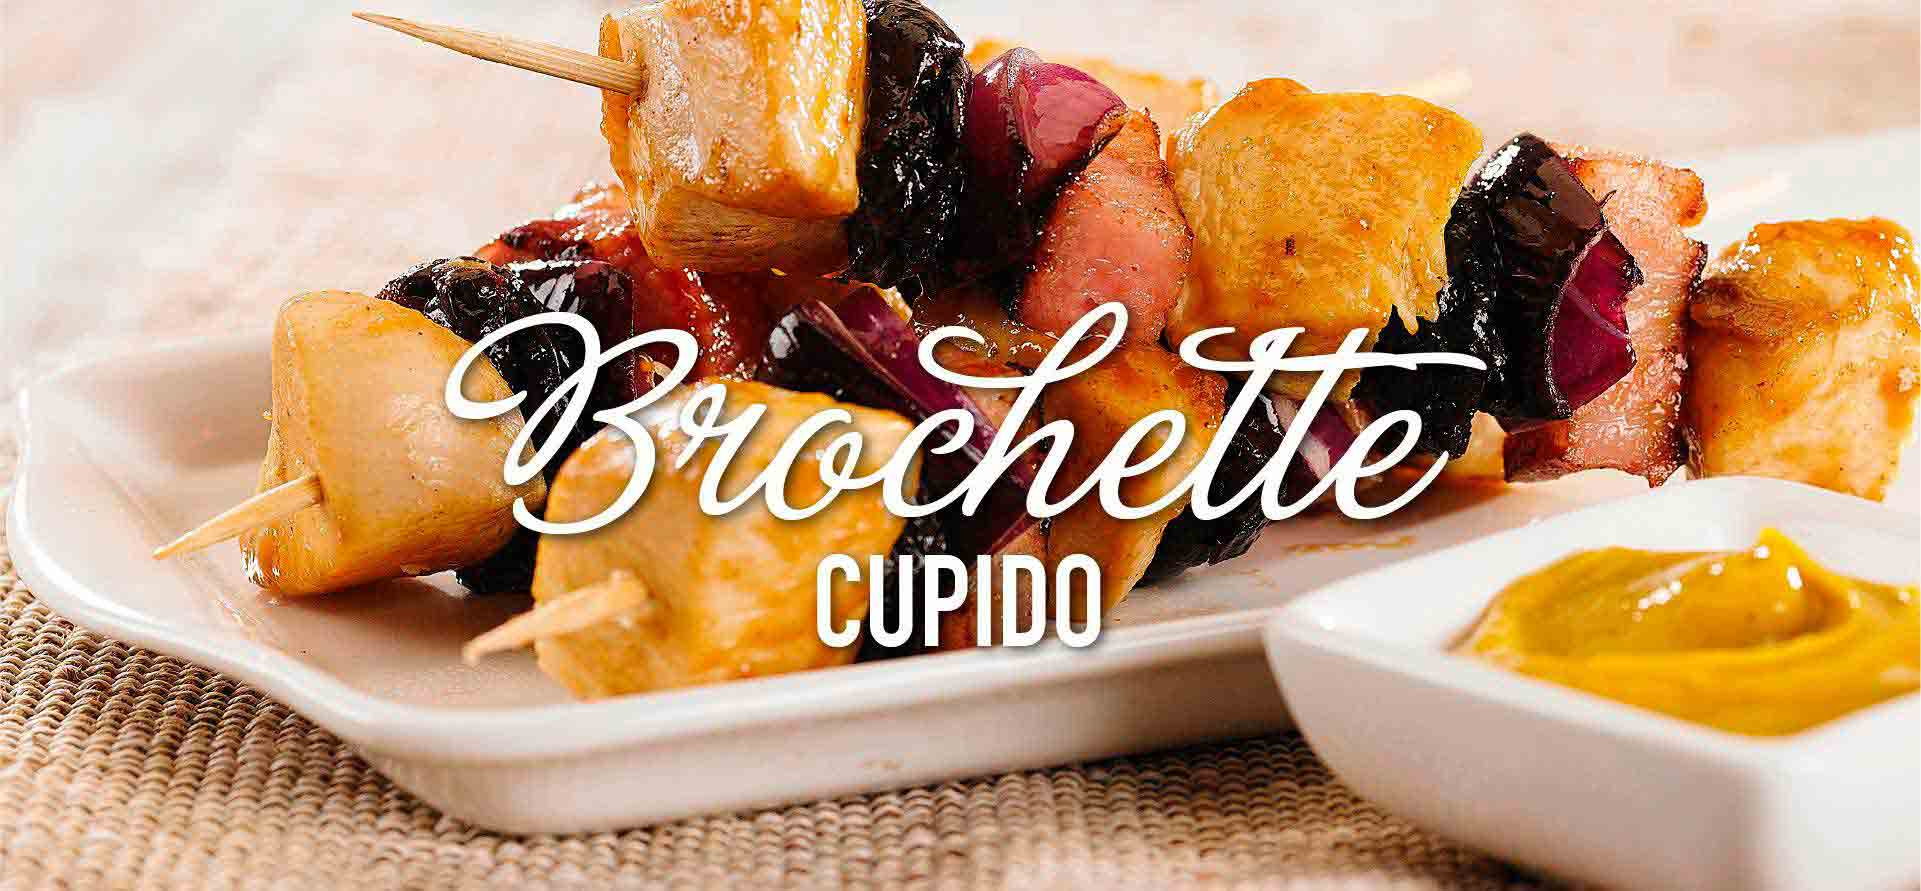 Brochette Cupido